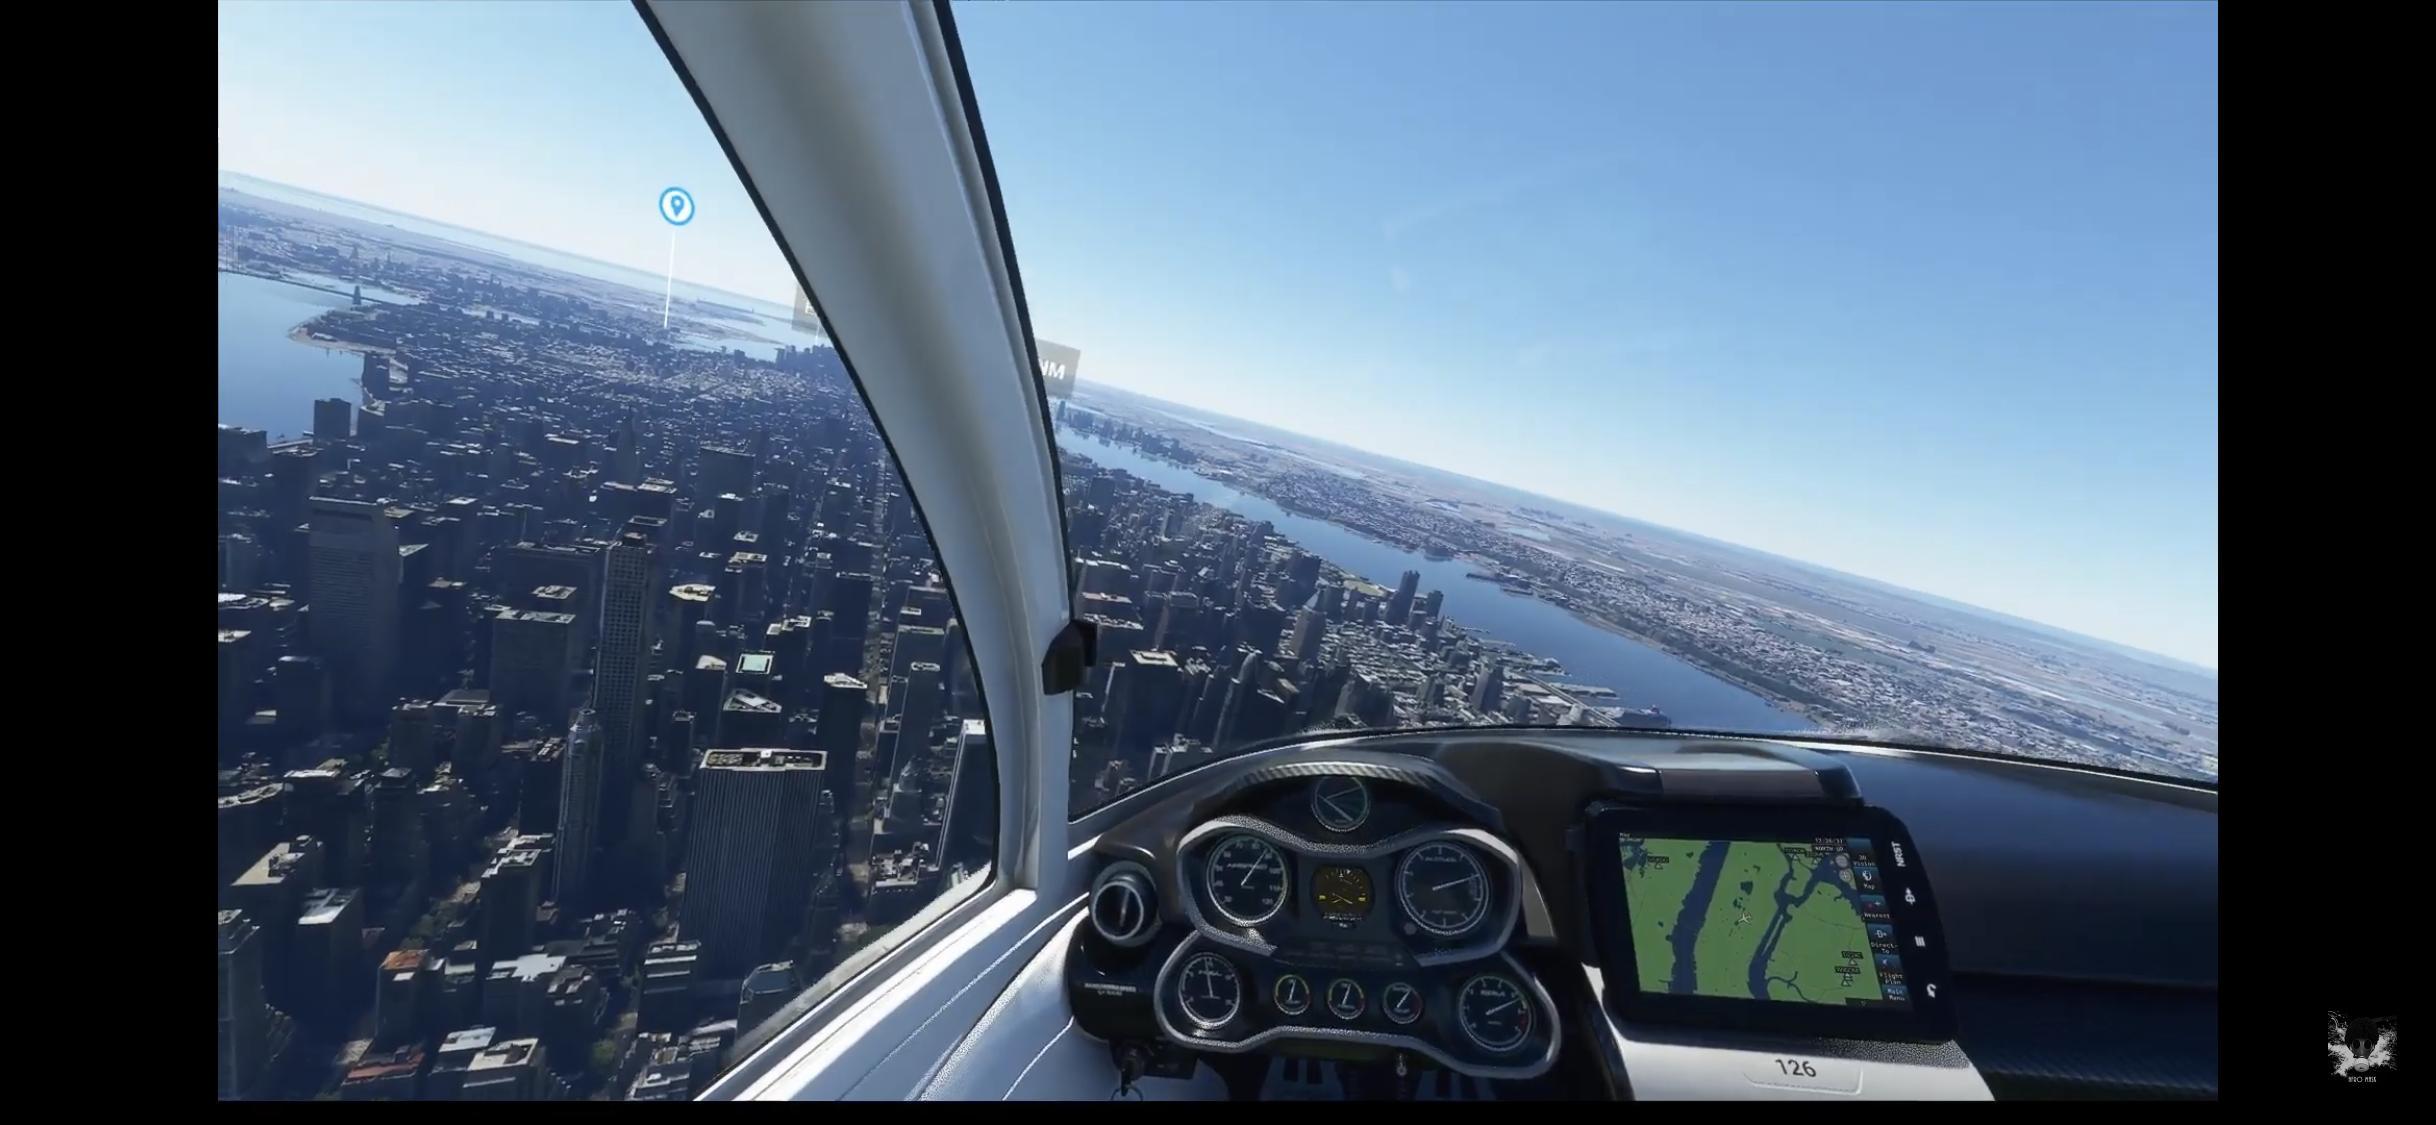 a0OdCQ8 - 神ゲー『Microsoft Flight Simulator』の地上グラフィックがマジでショボすぎる